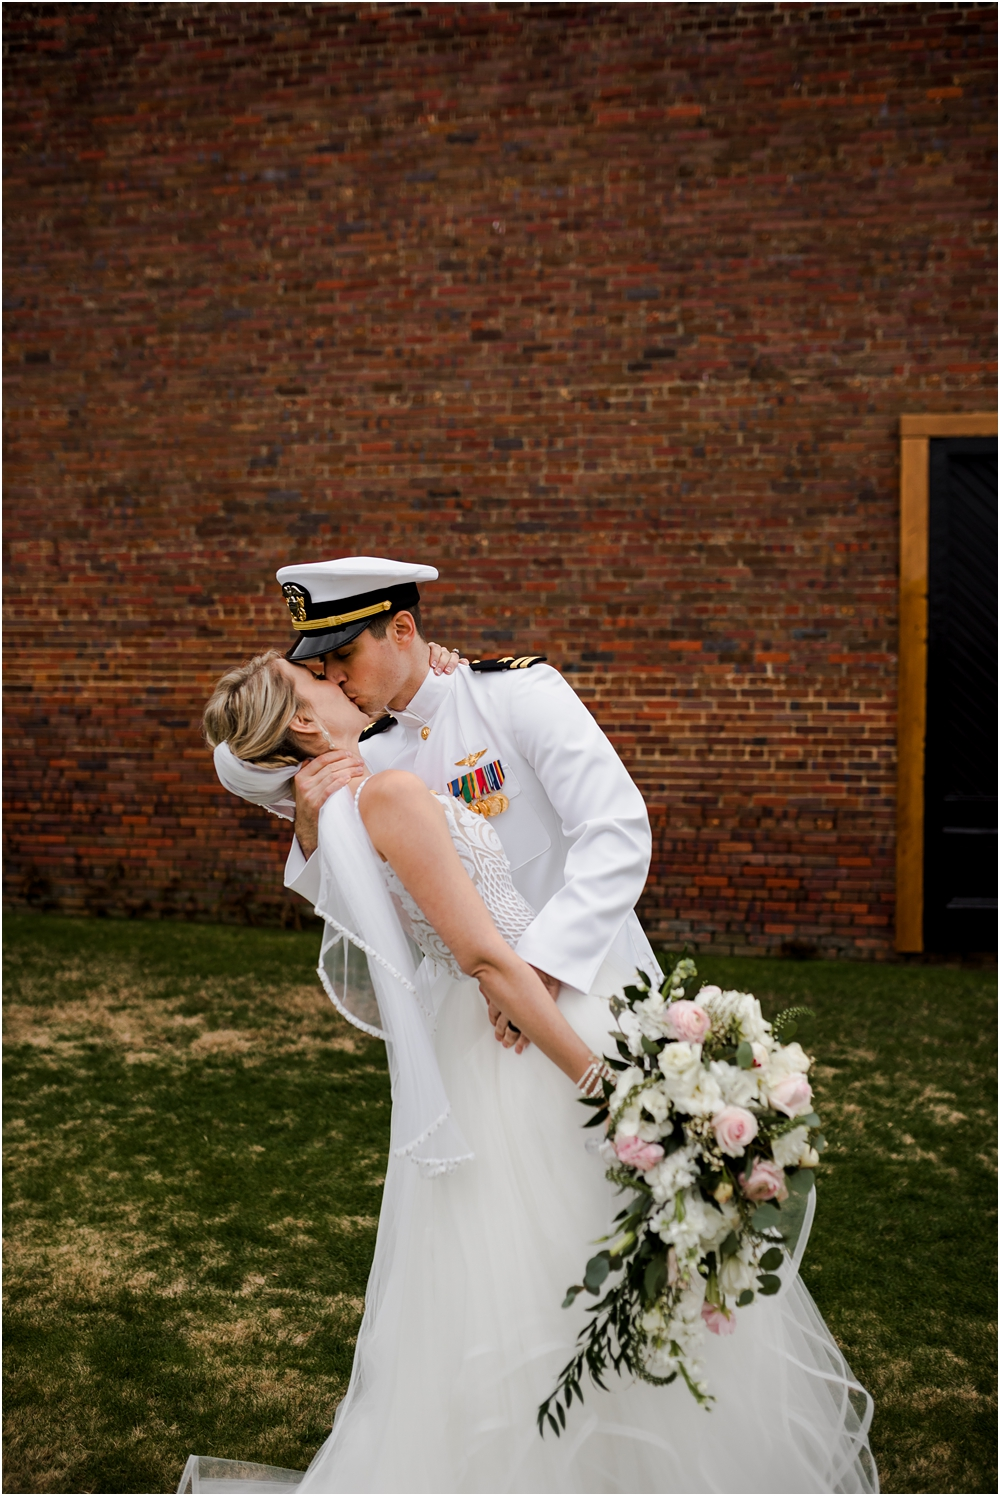 oconnor-pensacola-florida-wedding-photographer-kiersten-taylor-68.jpg